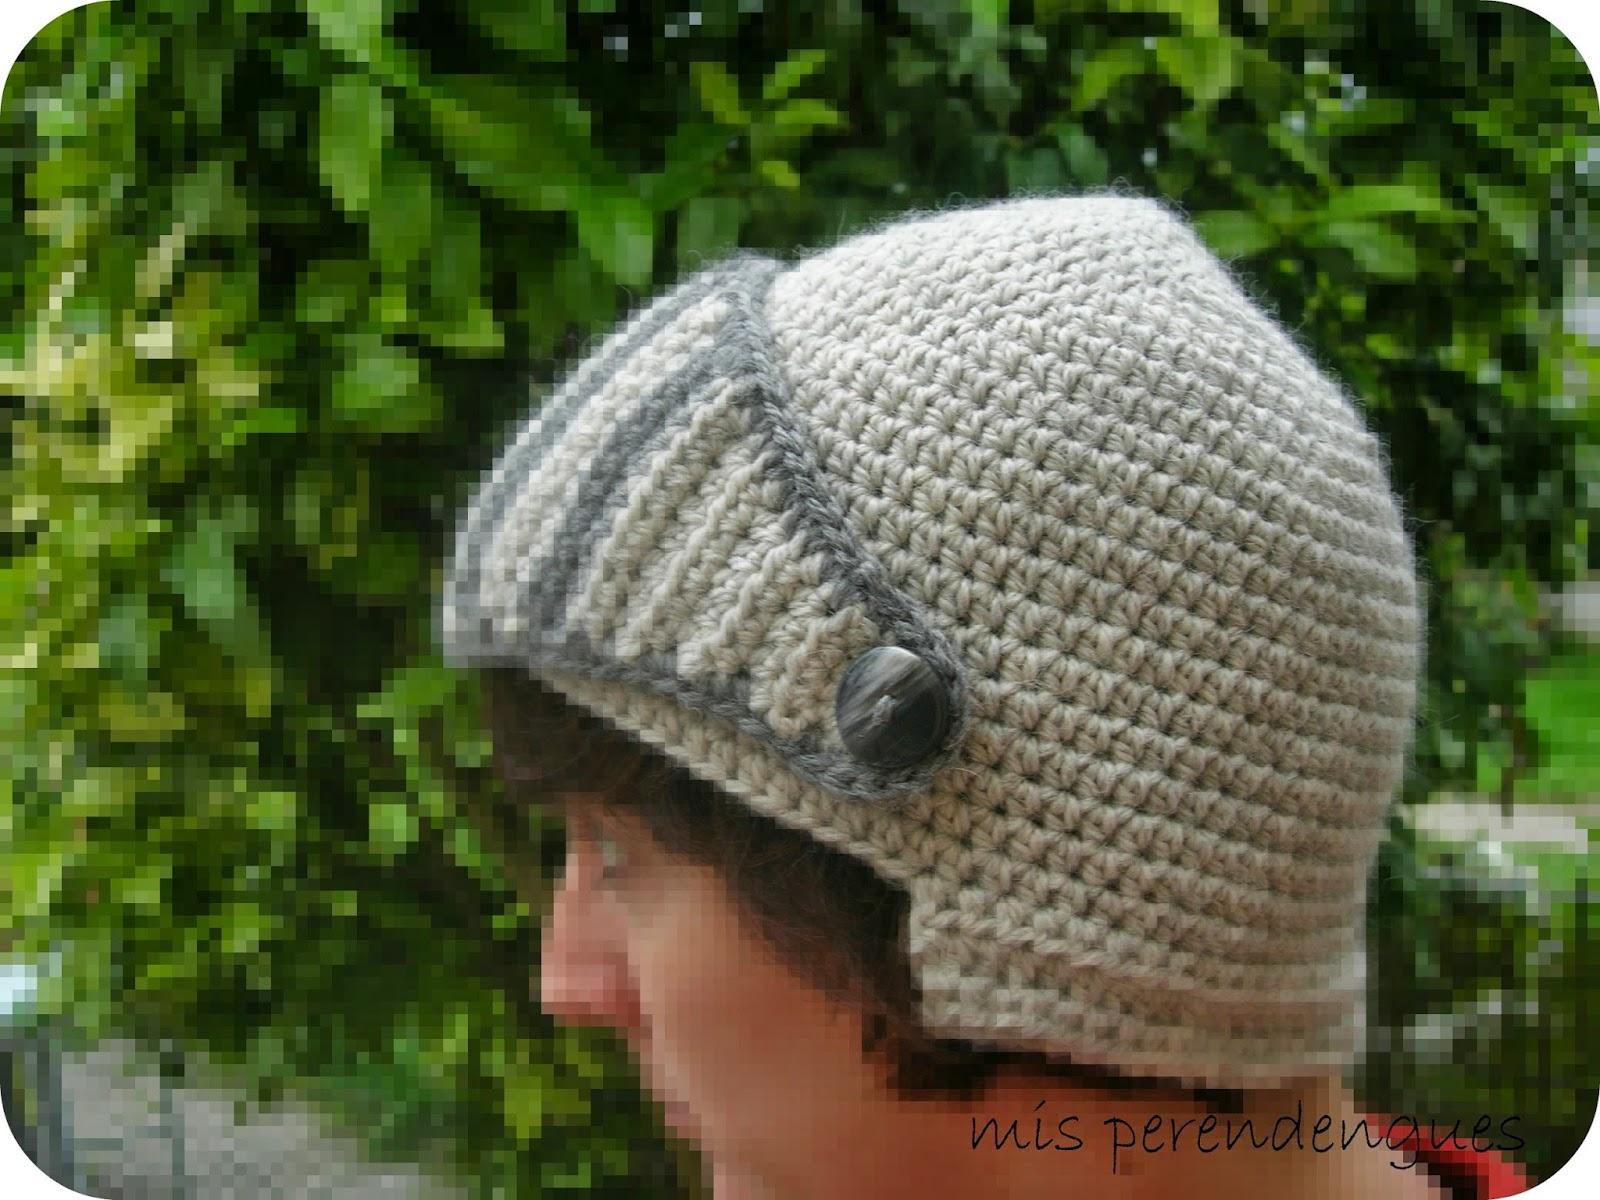 Mis perendengues  Gorro-casco medieval dac610bf0e2